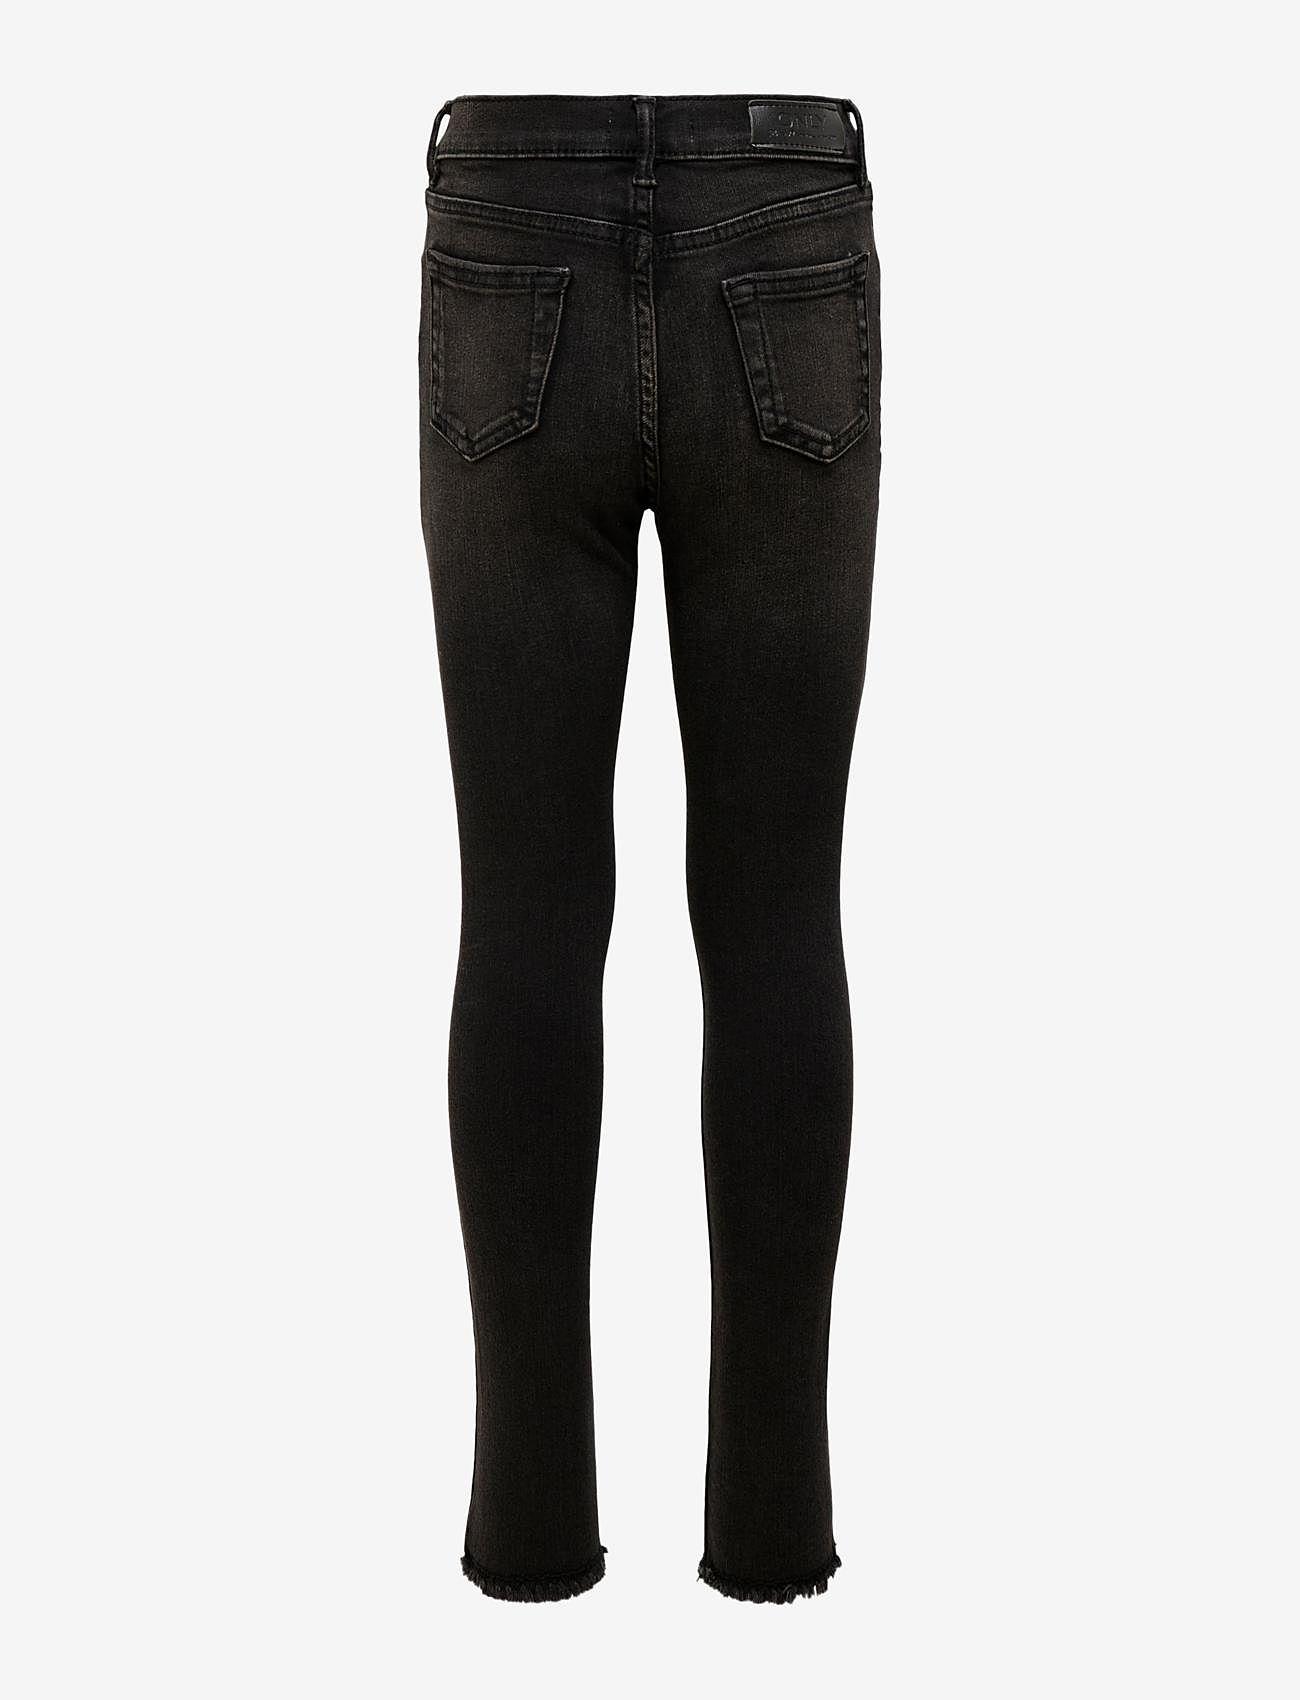 Kids Only - KONBLUSH SKINNY RAW JEANS 1099 NOOS - jeans - black denim - 1